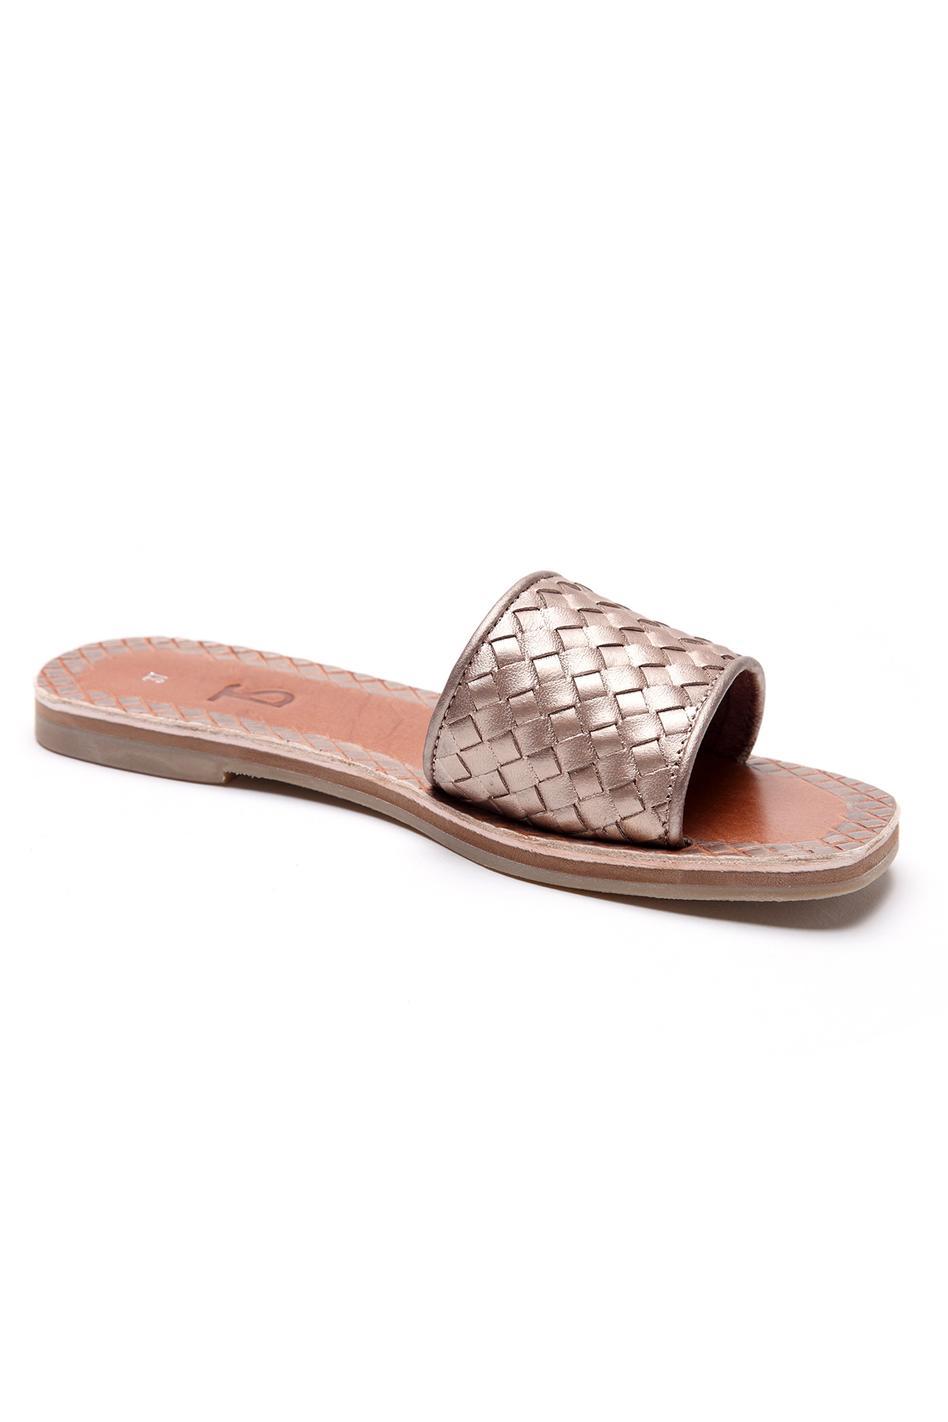 Metallic Textured Strap Sliders